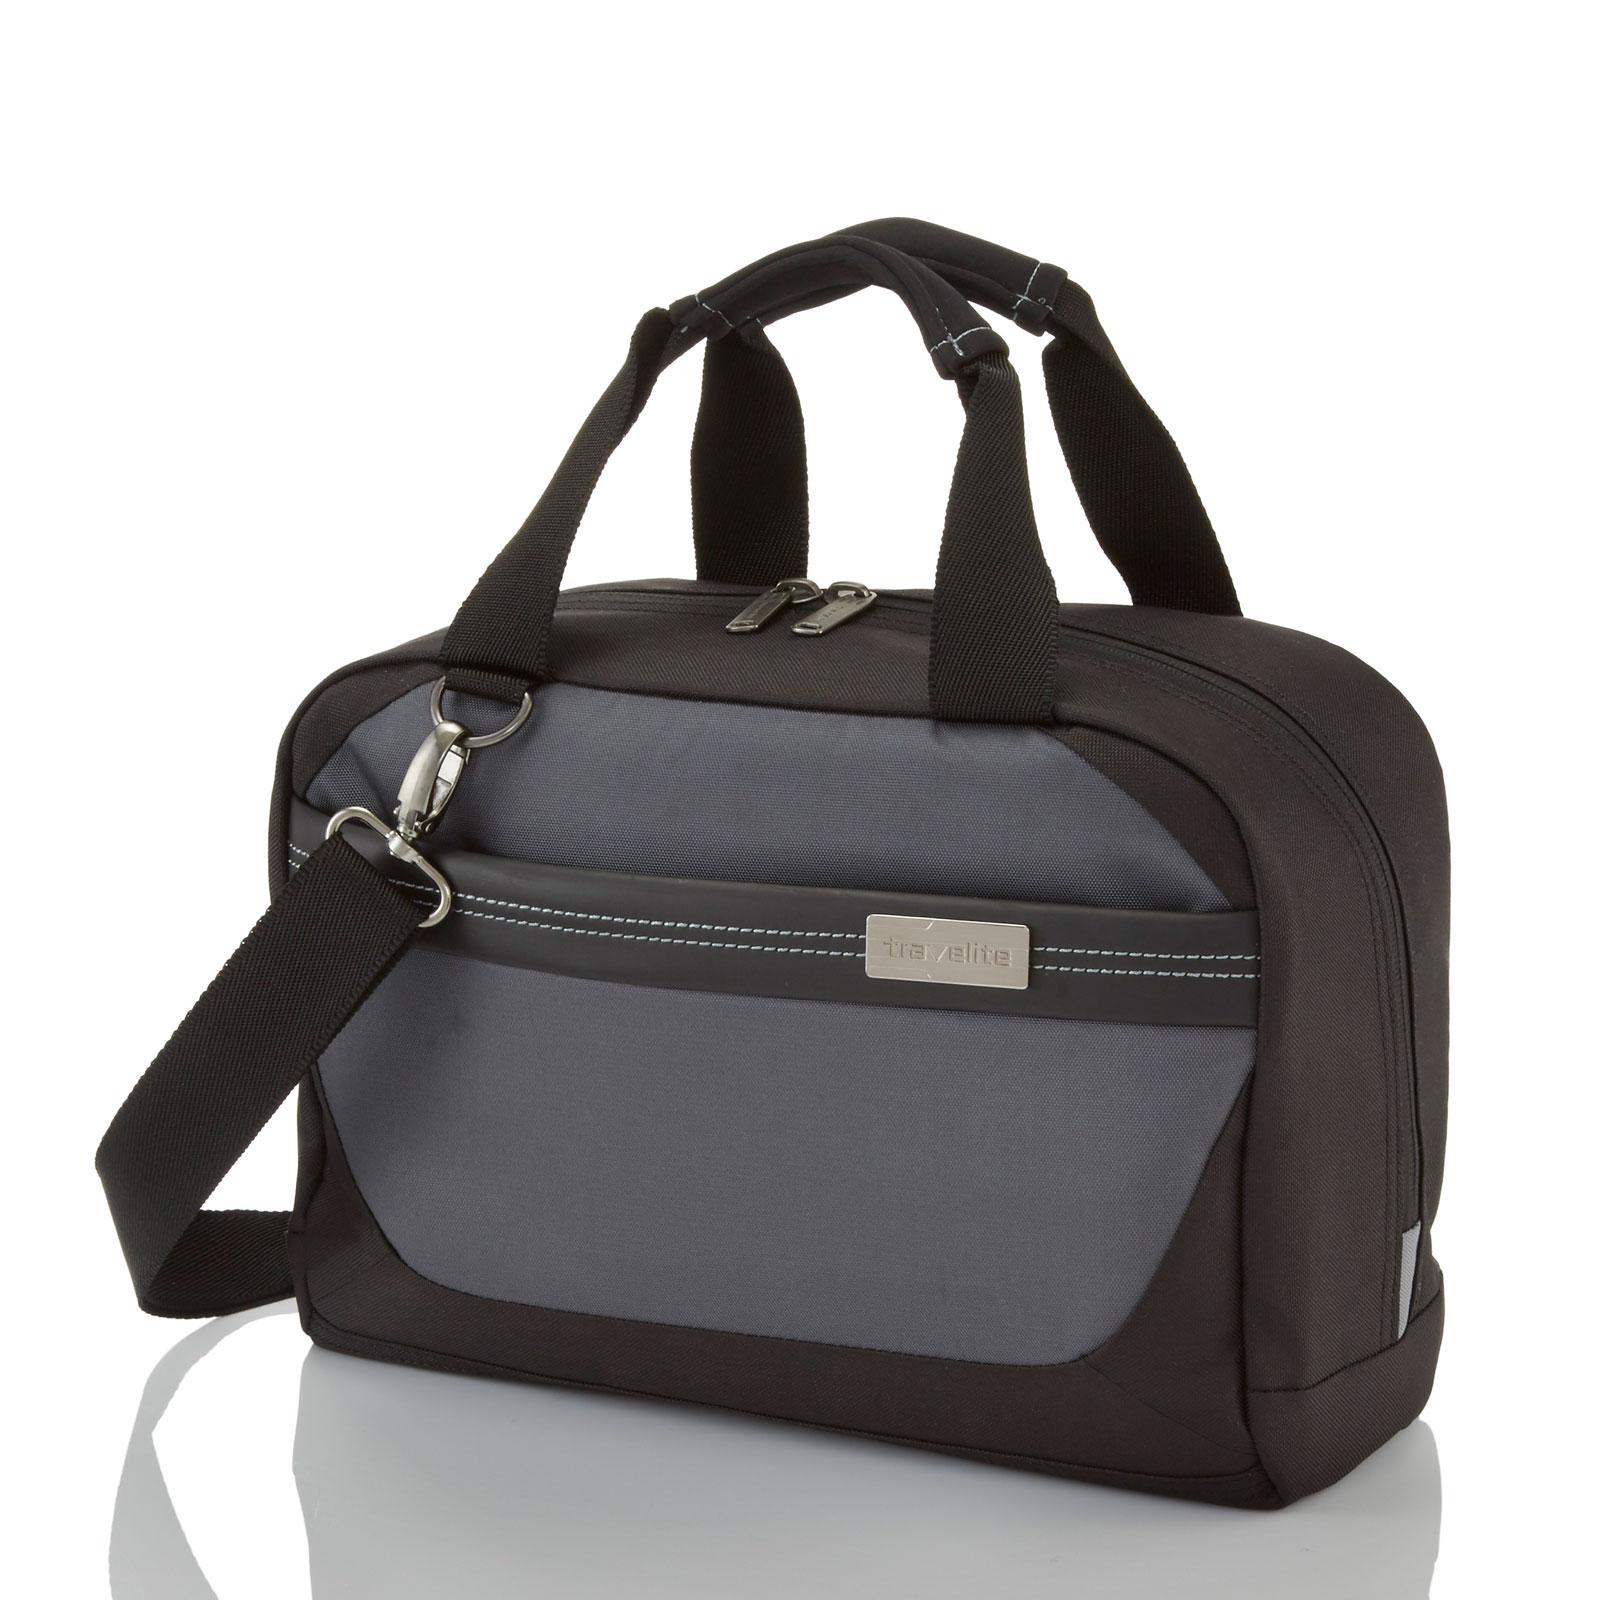 travelite meteor beautybag 33 cm g nstig kaufen koffermarkt. Black Bedroom Furniture Sets. Home Design Ideas